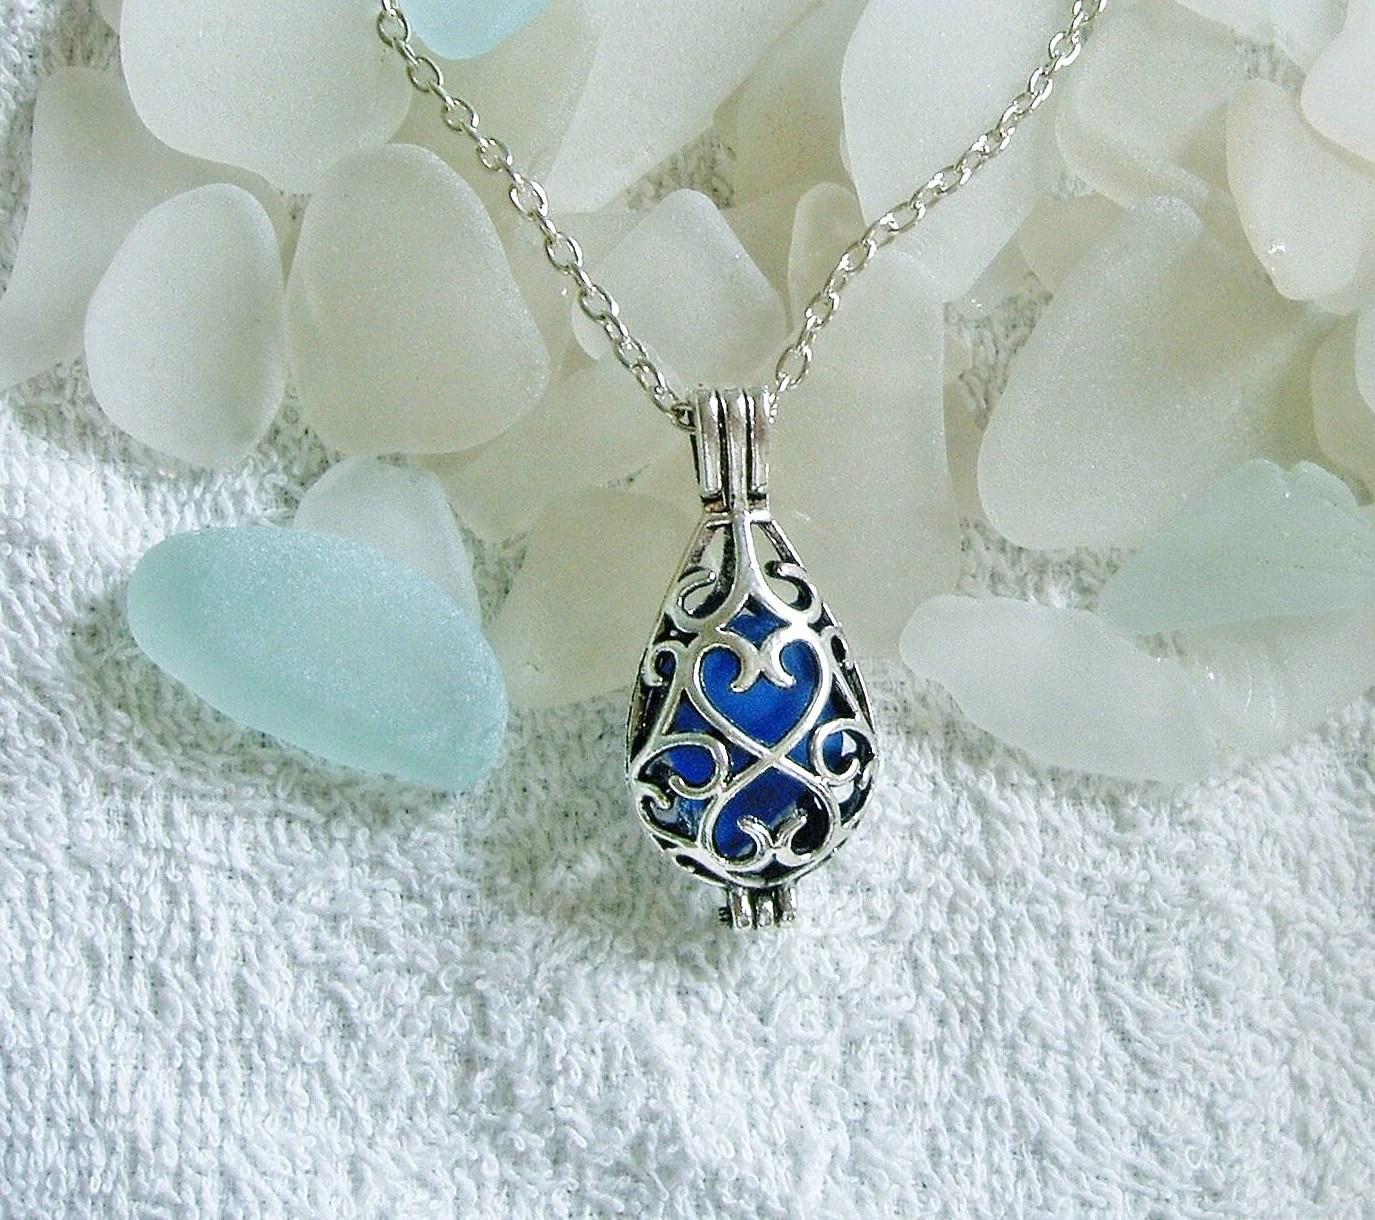 Sea glass locket necklace. Blue teardrop locket. Sea glass jewelry. - EgyptianInspirations